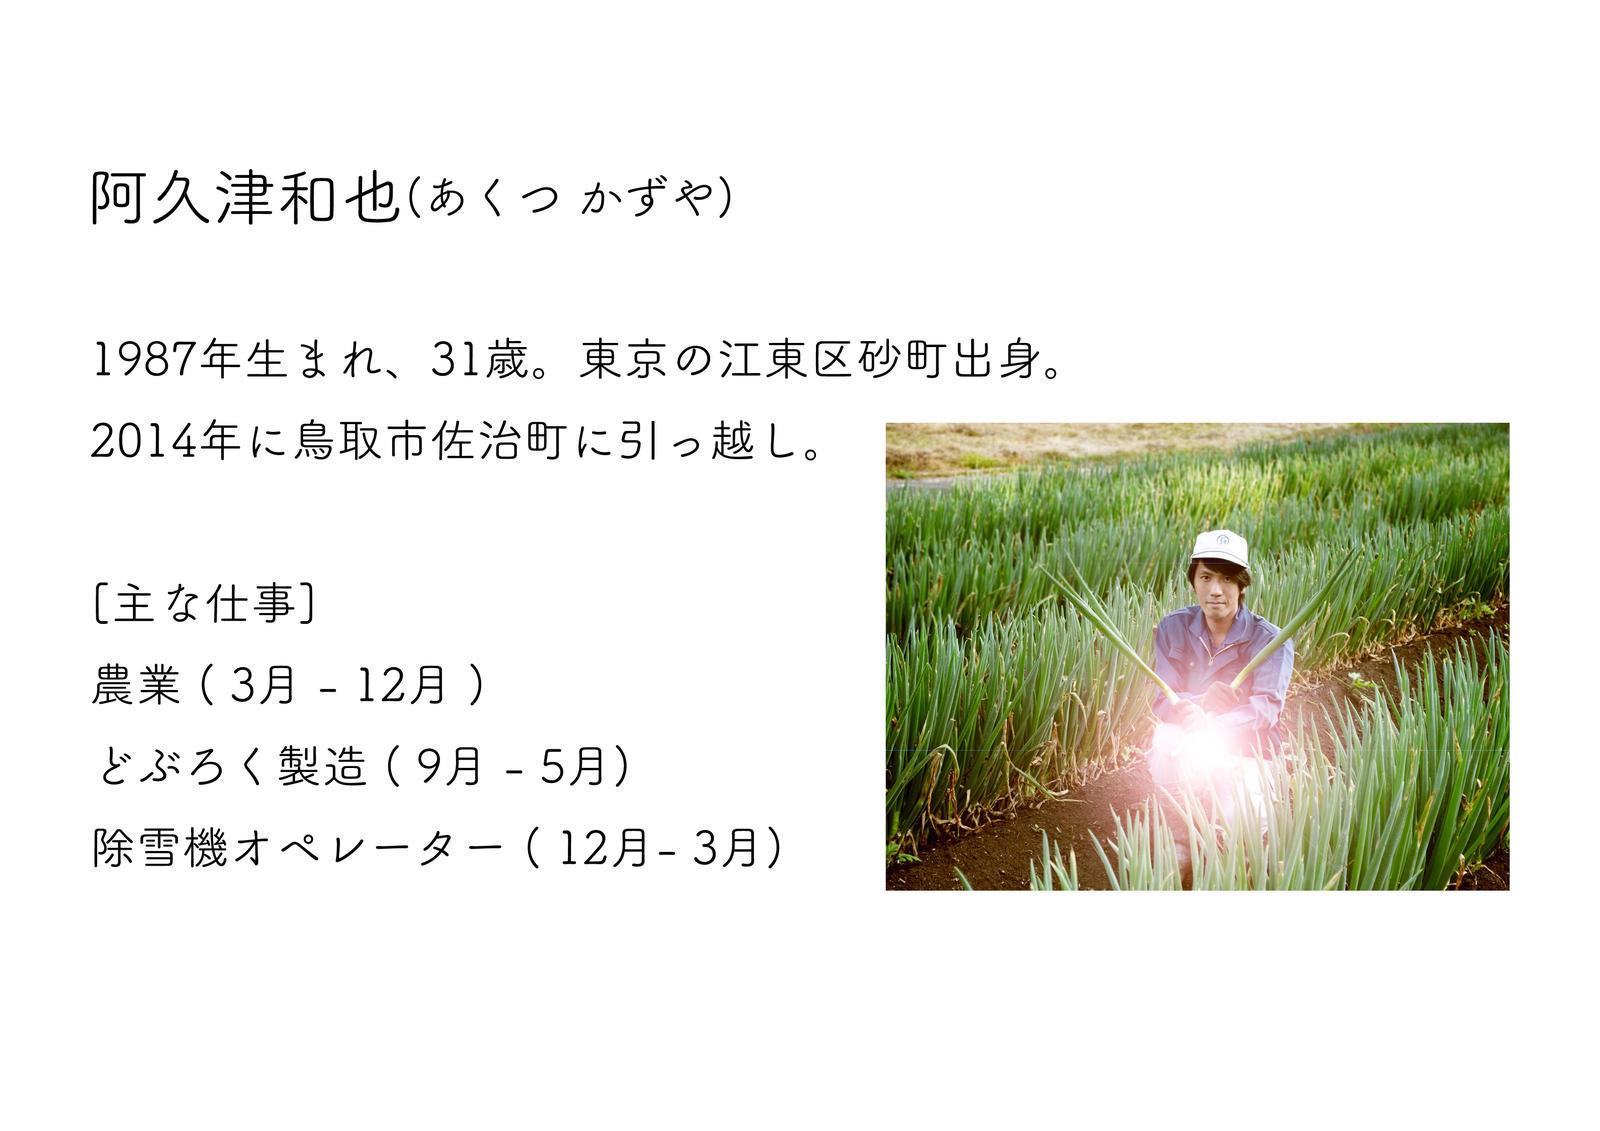 f:id:tottoridekurasu:20181224230725j:plain